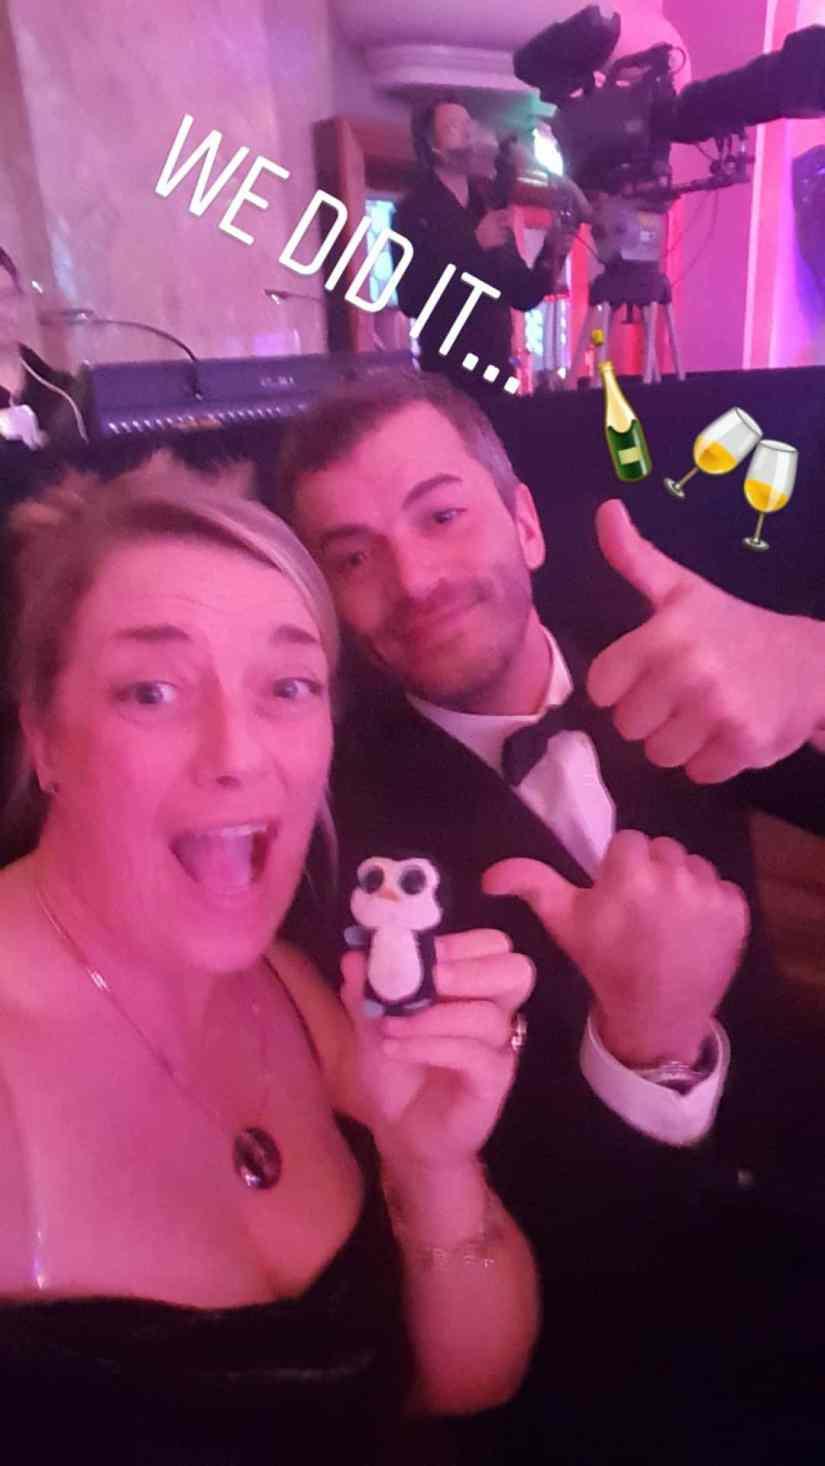 TTMA18-travel-marketing-awards-2018-4